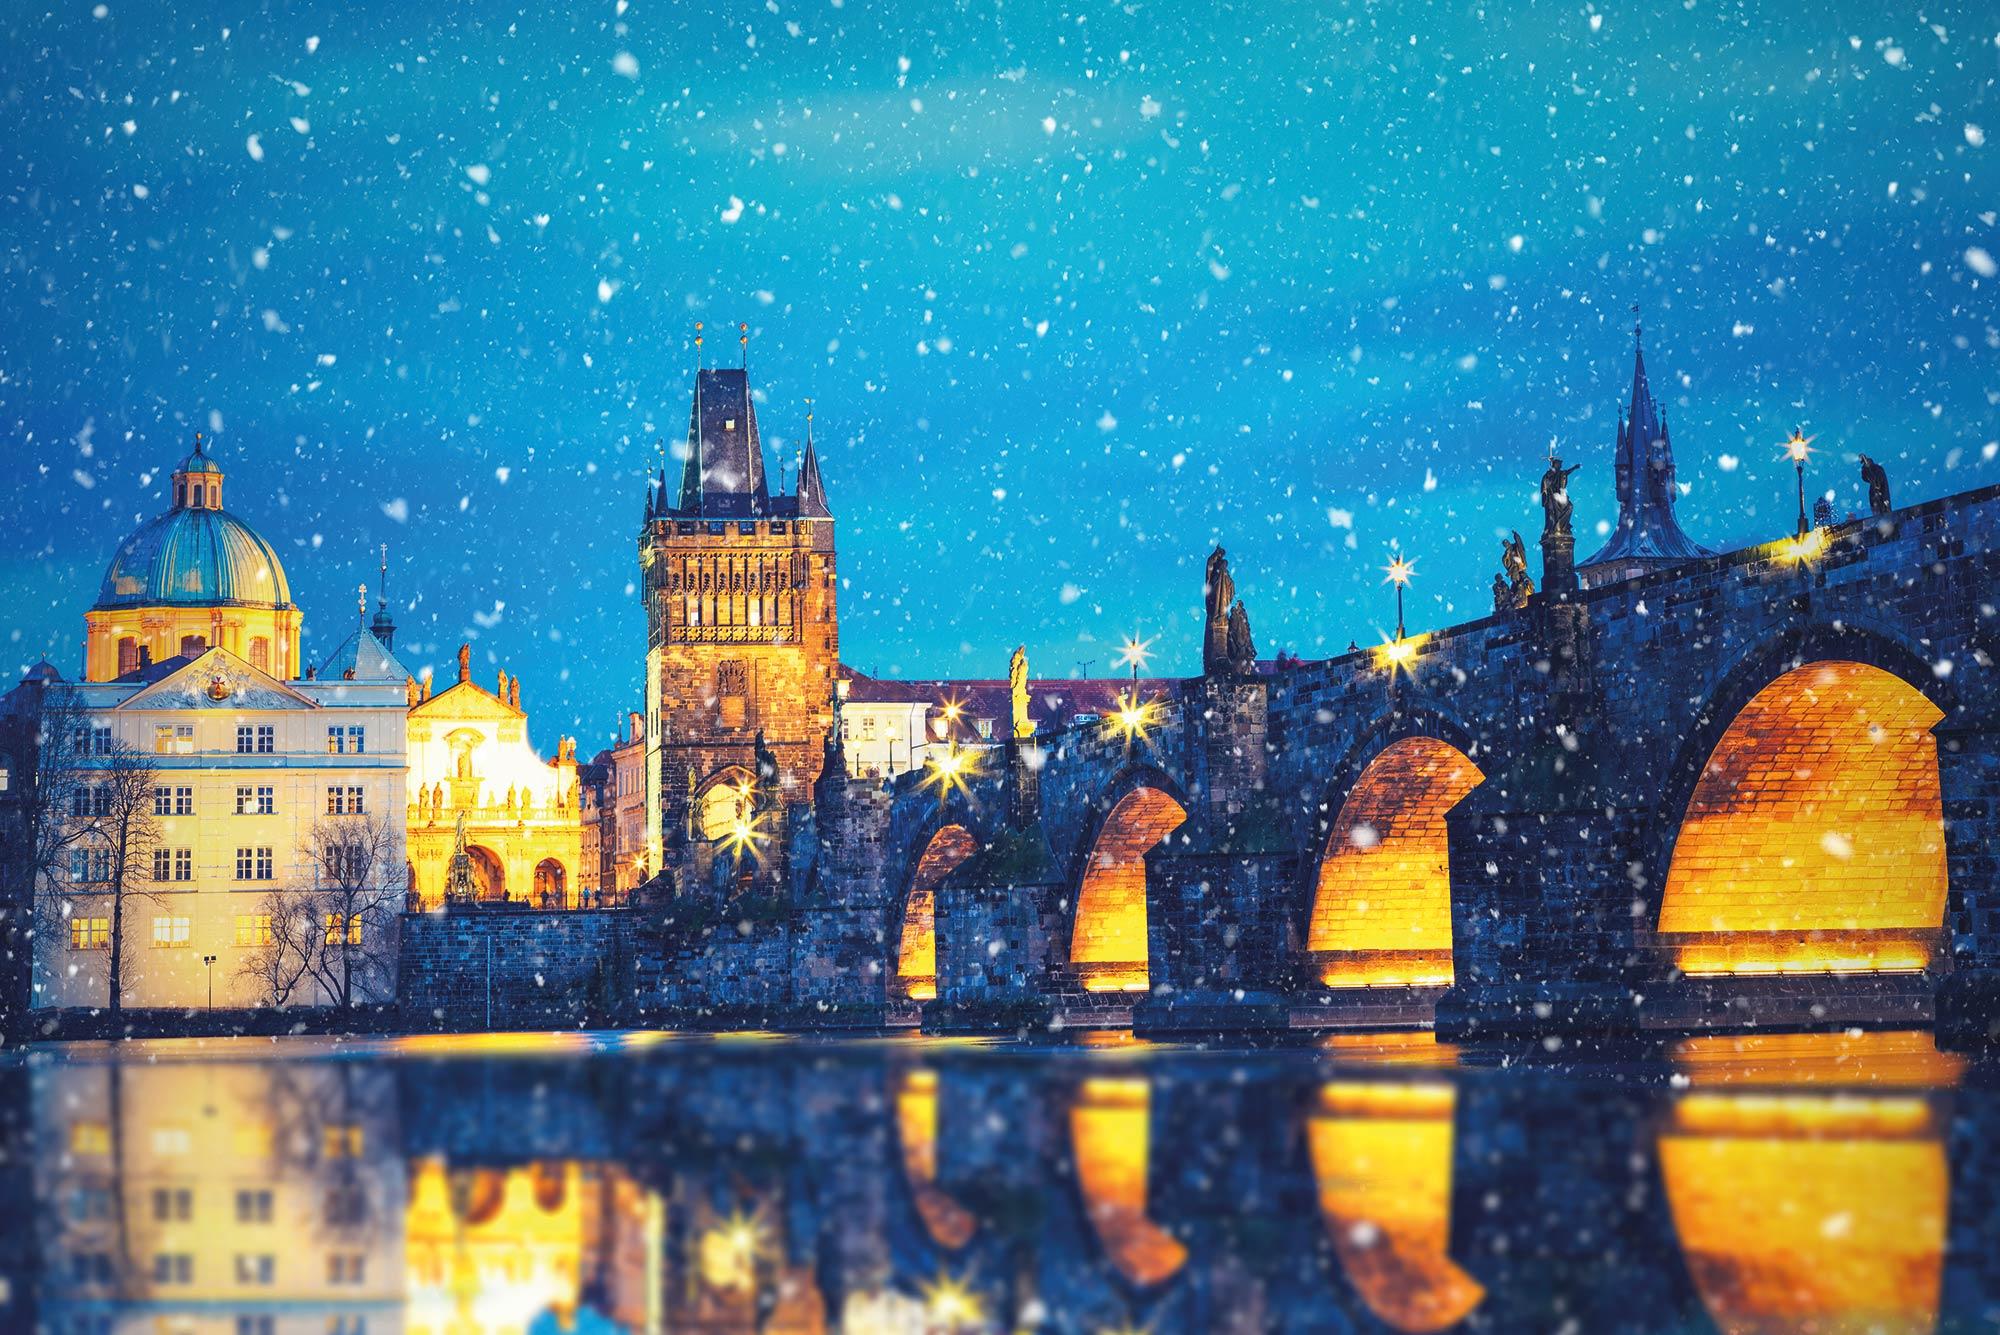 The Charles Bridge crossing the Vltava River in Prague.